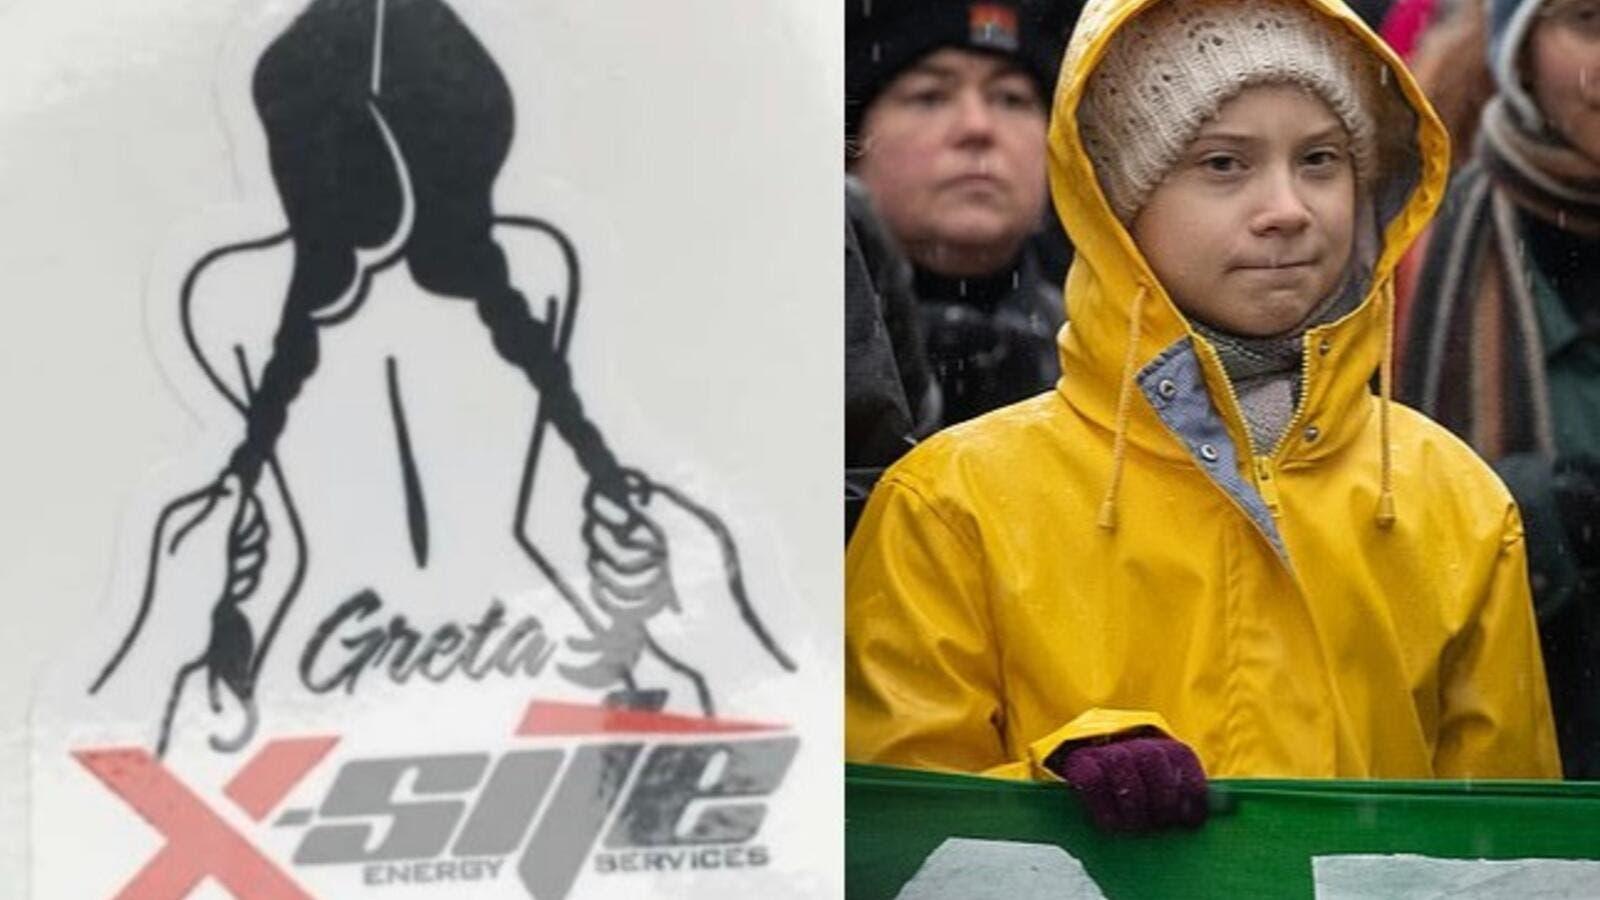 Canadian Oil Firm Under Fire After Sick Rape Cartoon of Greta Thunberg